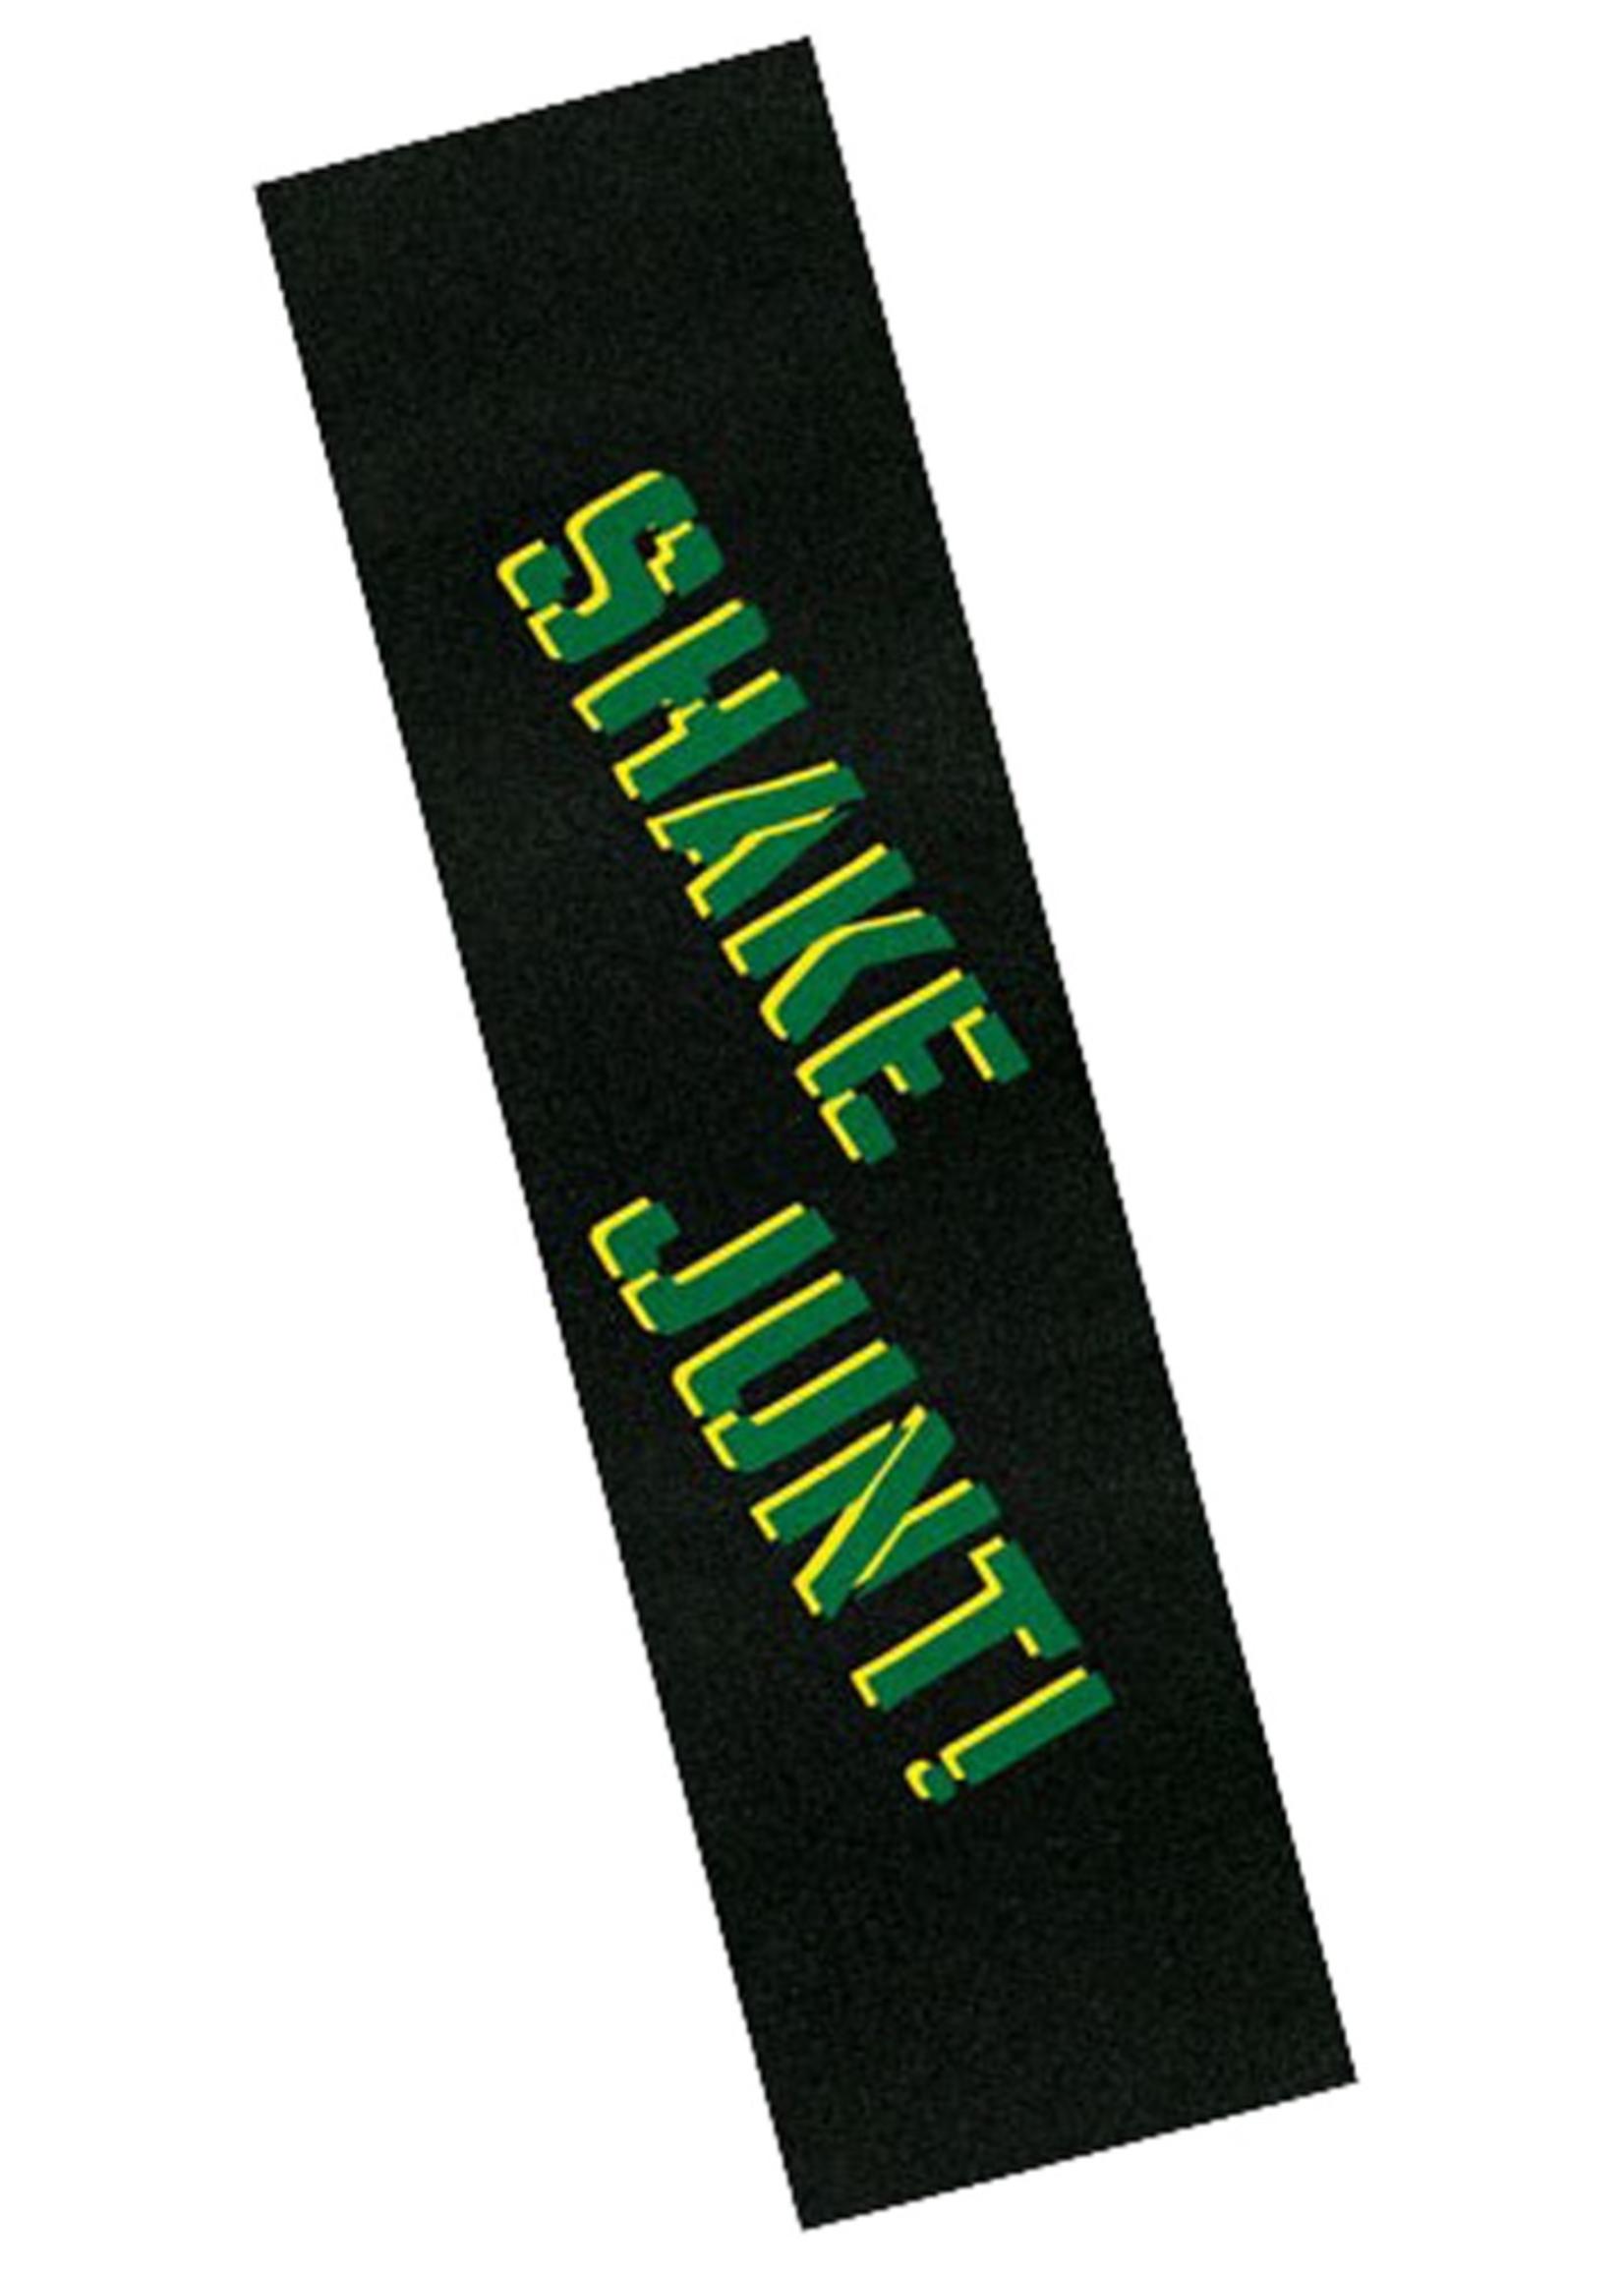 Shake Junt Graphic Grip Tape